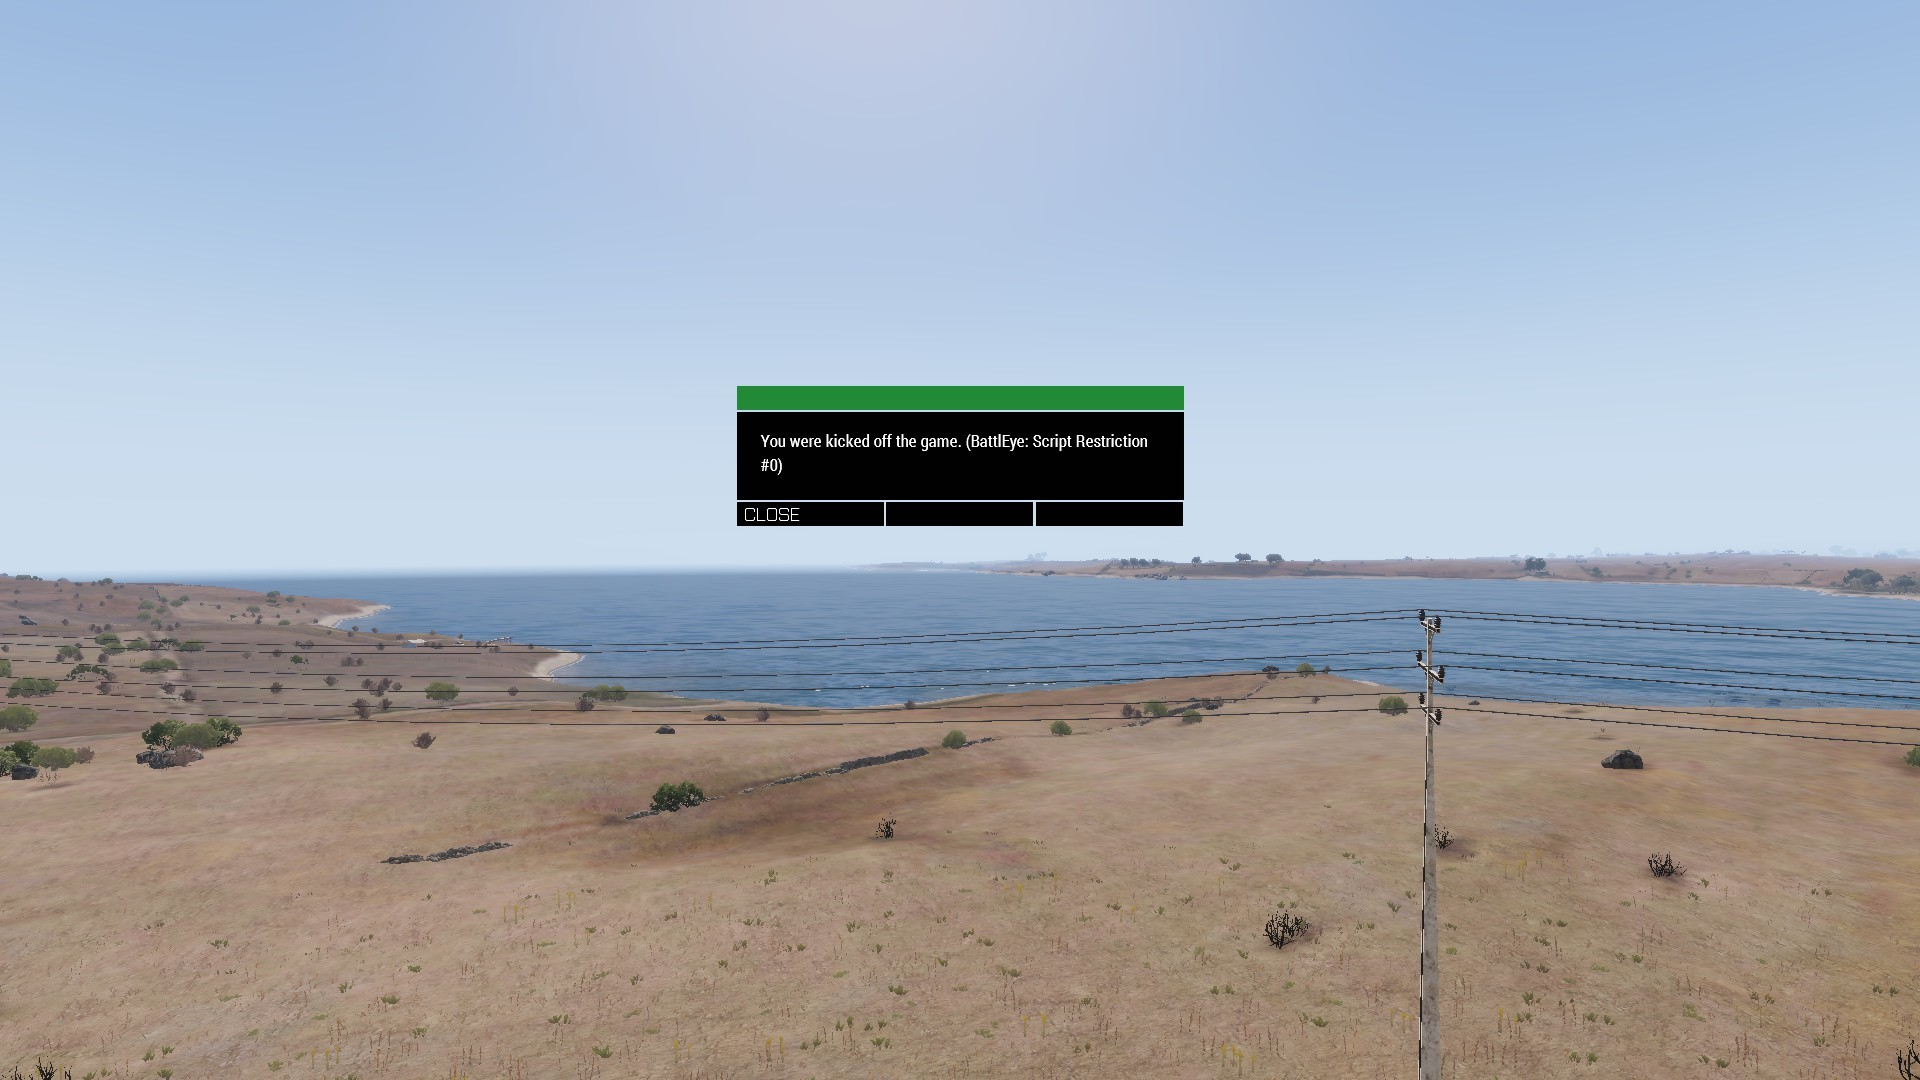 ARMA III battleye sıkıntısı yardım edin - Arma III - Yardım